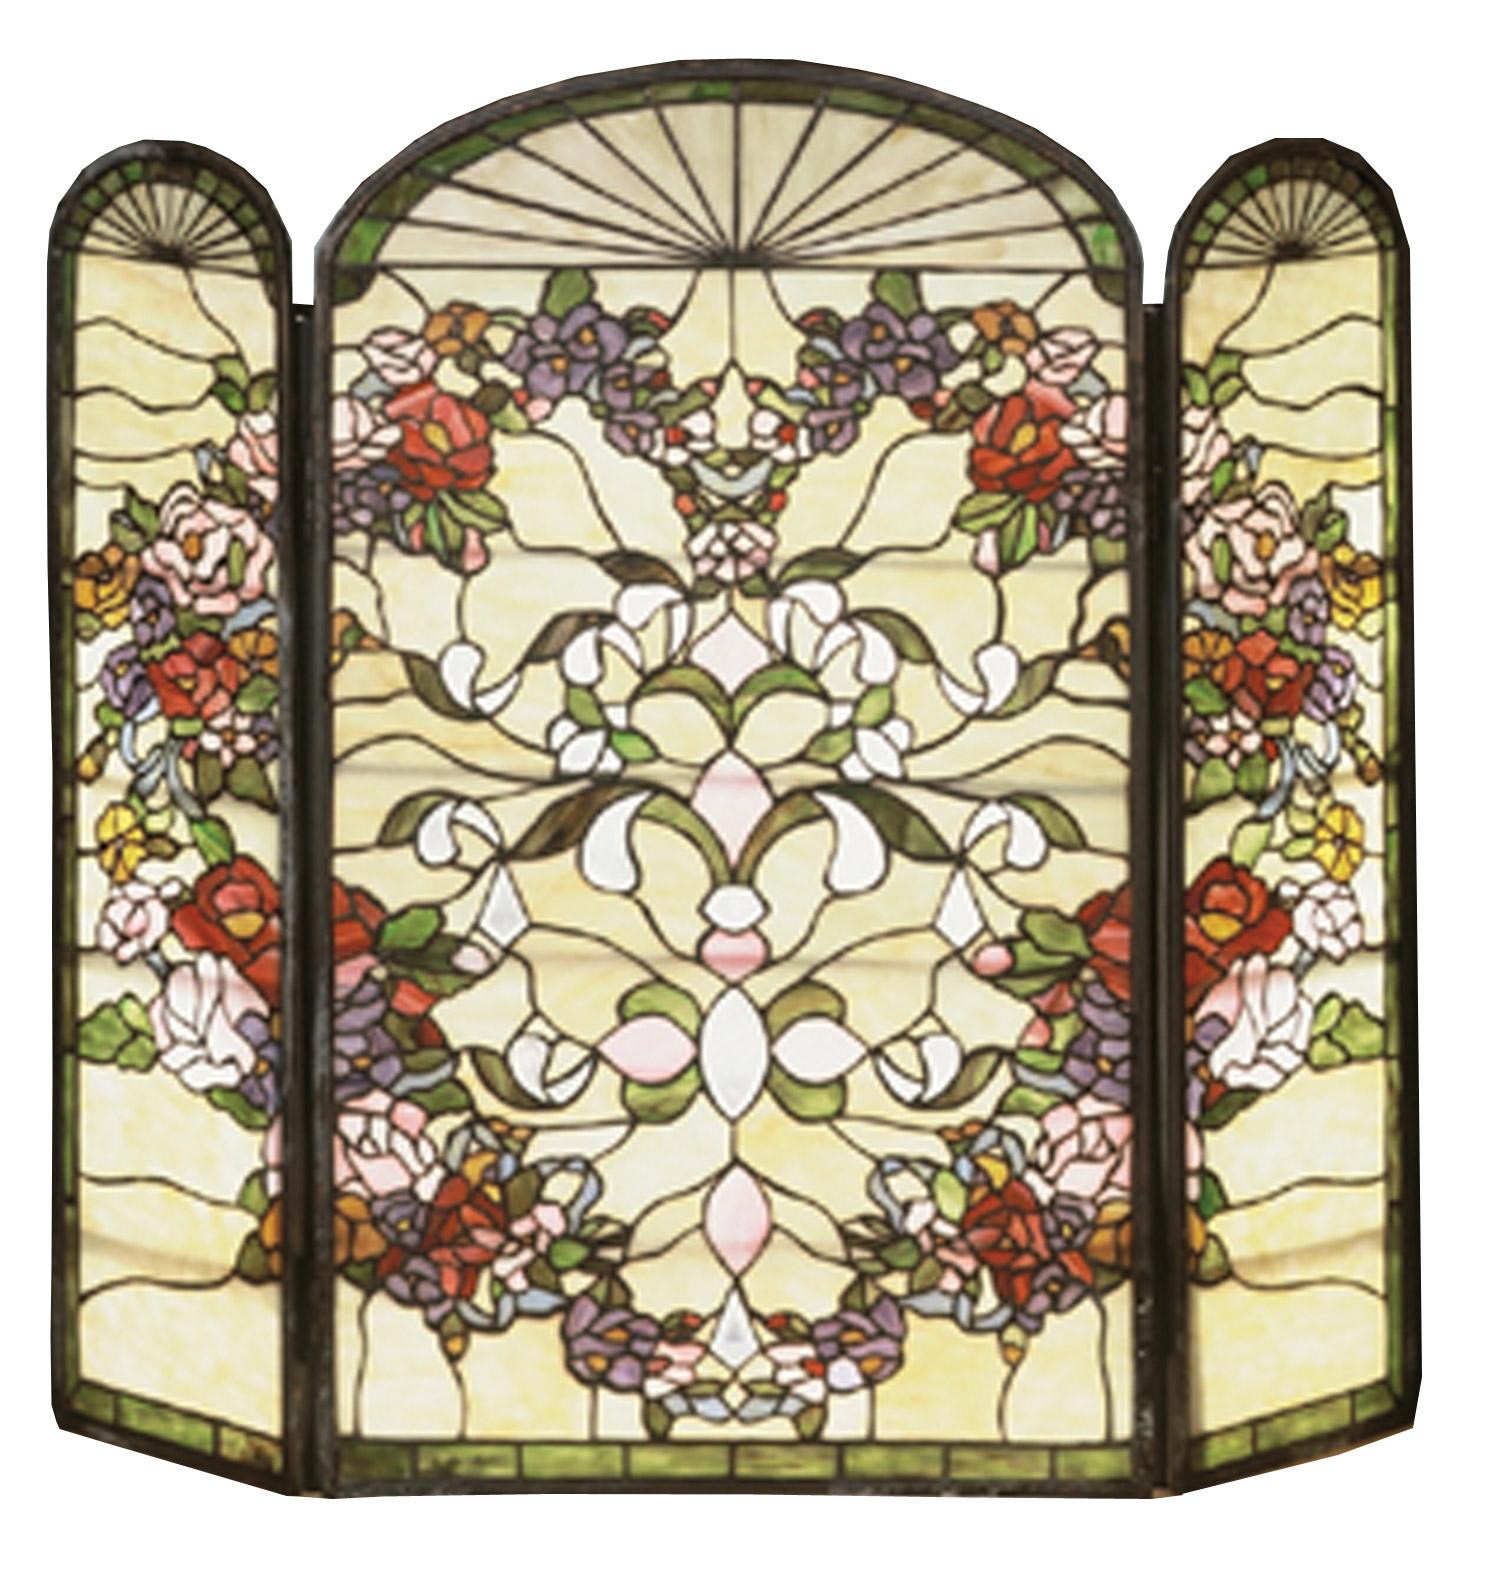 Meyda 47991 Tiffany Heart Folding Fireplace Screen